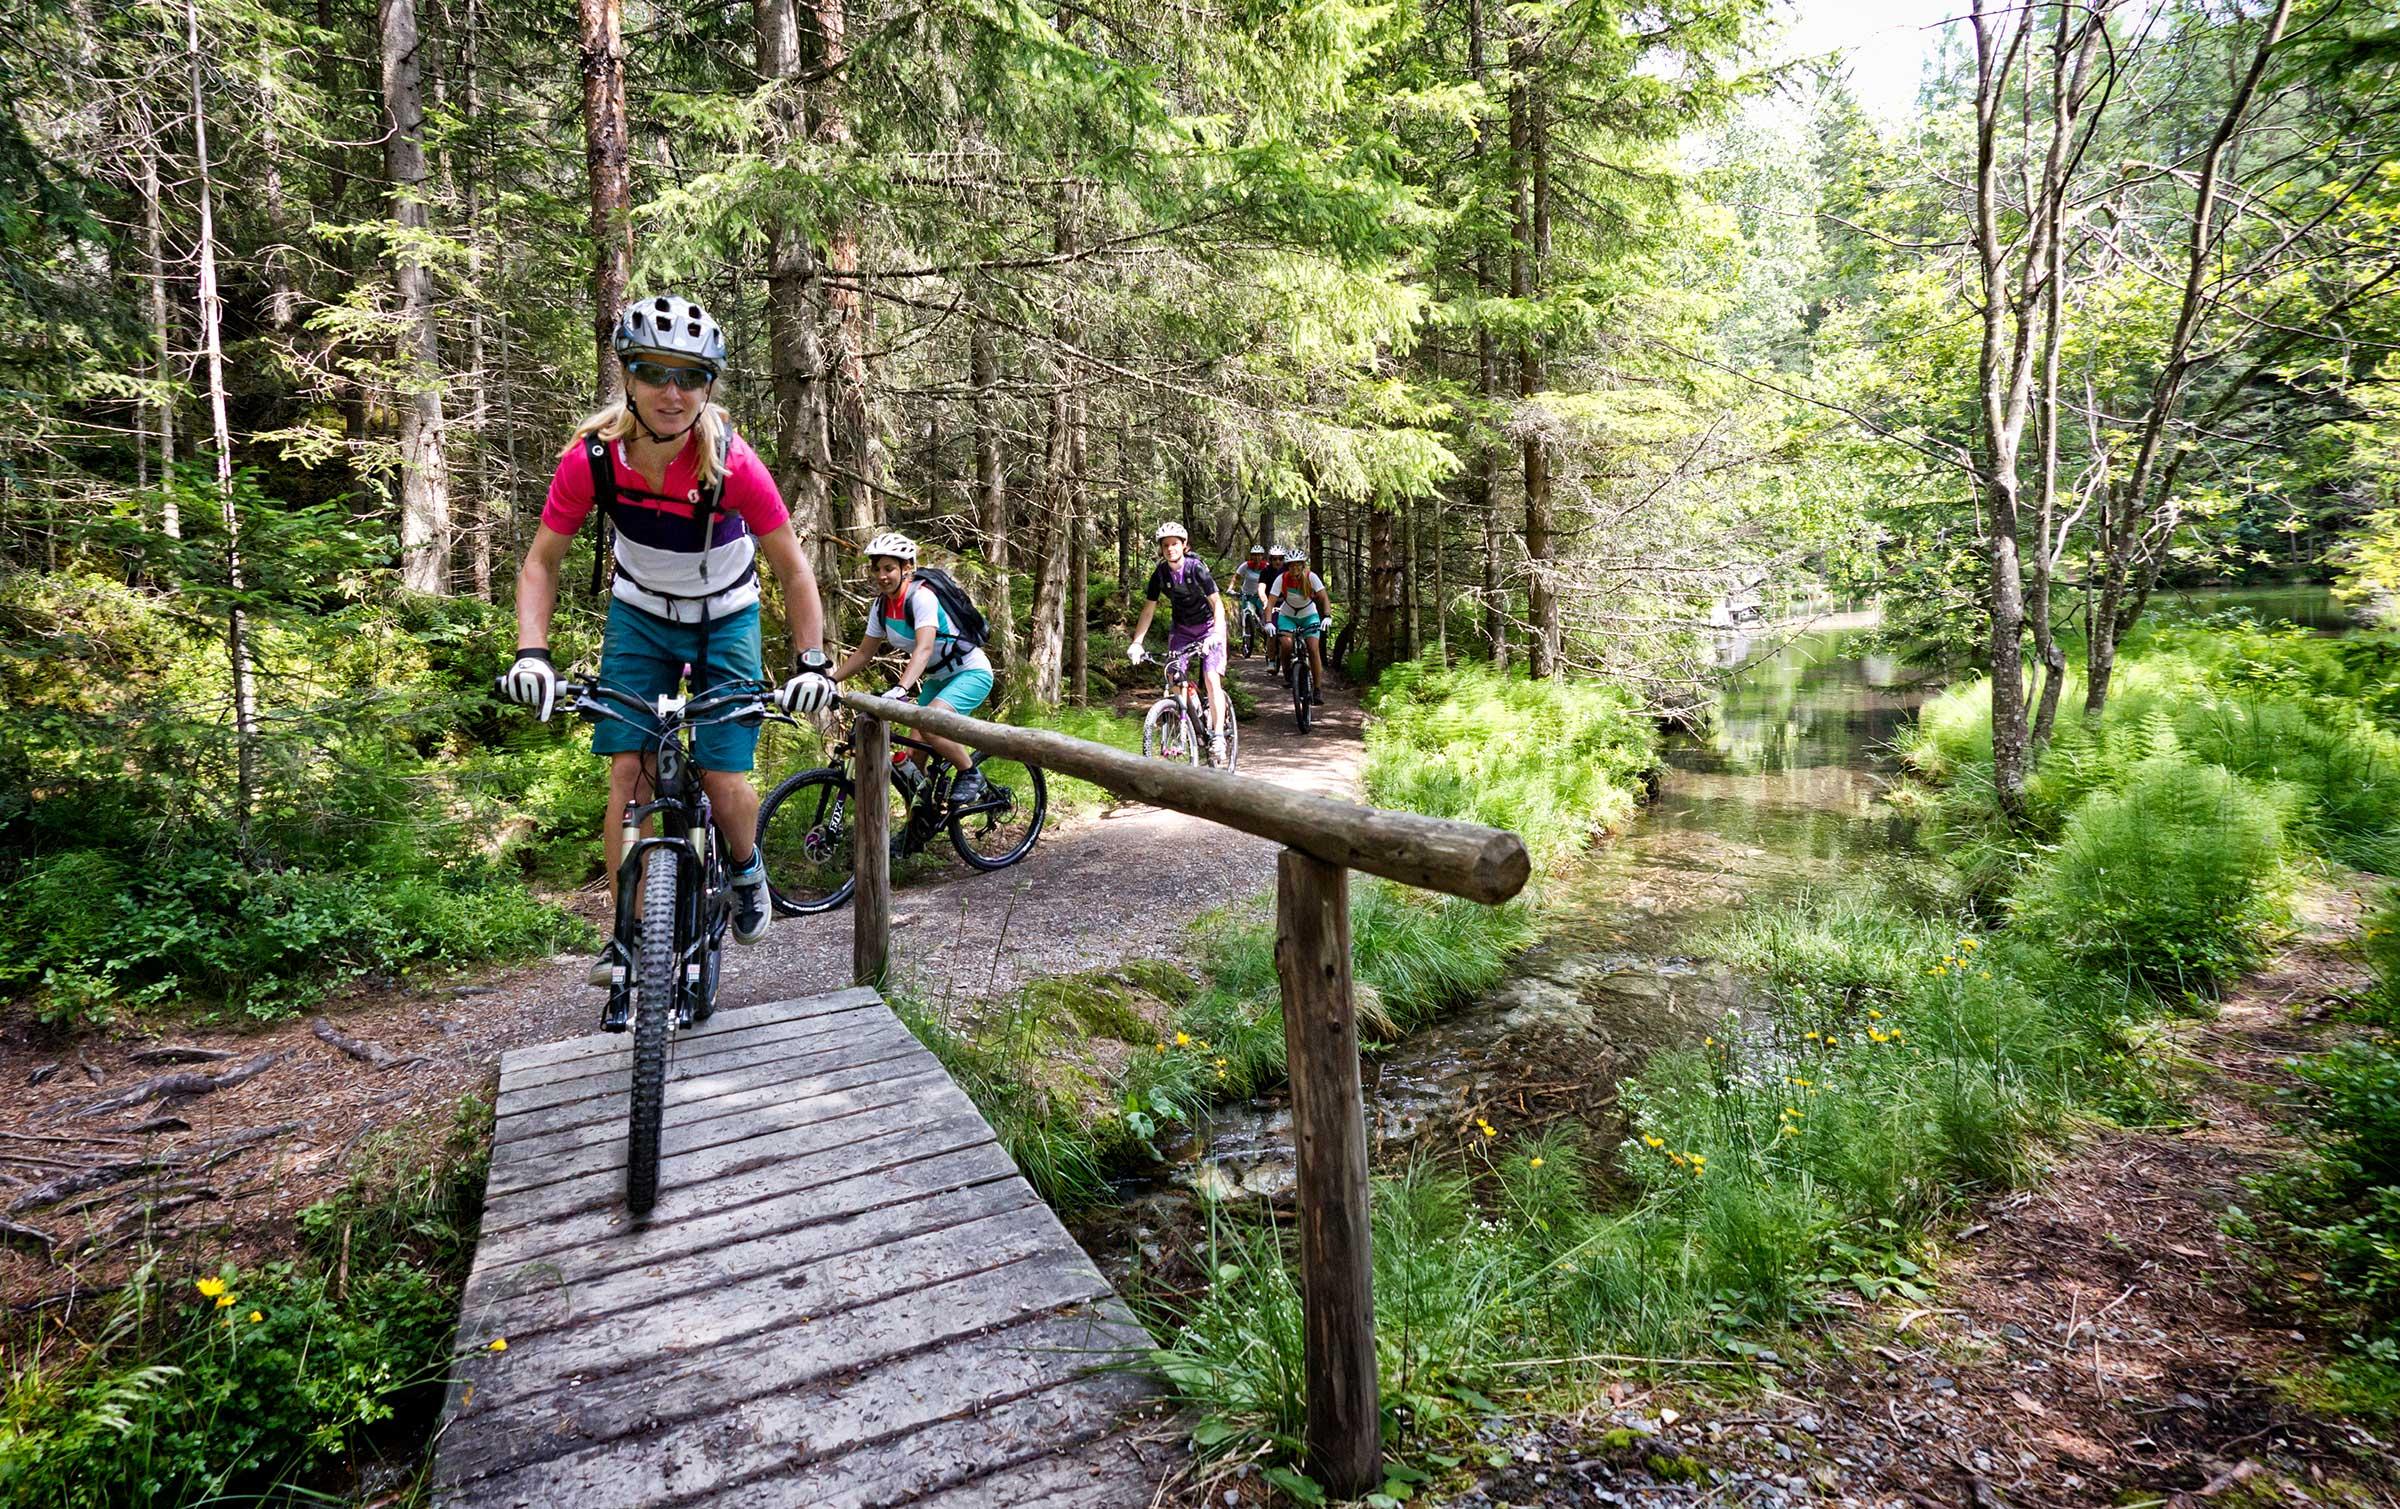 Biketour zum Piburger See - Rafting & Canyoning Ötztal